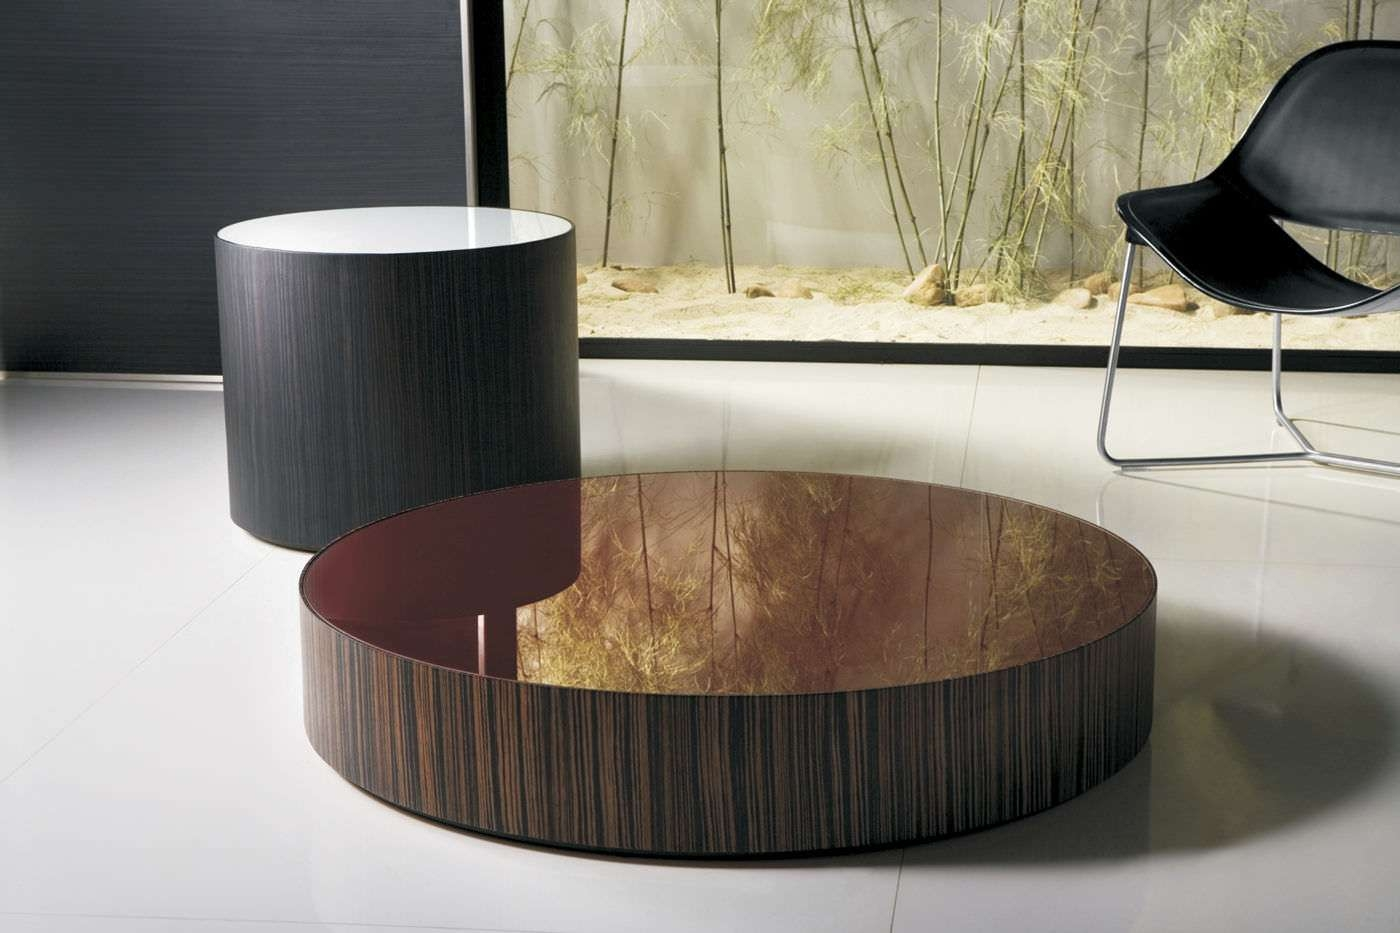 Most Recently Released Contemporary Coffee Table Regarding Elegant Decor Contemporary Coffee Table — Novalinea Bagni Interior (View 4 of 20)